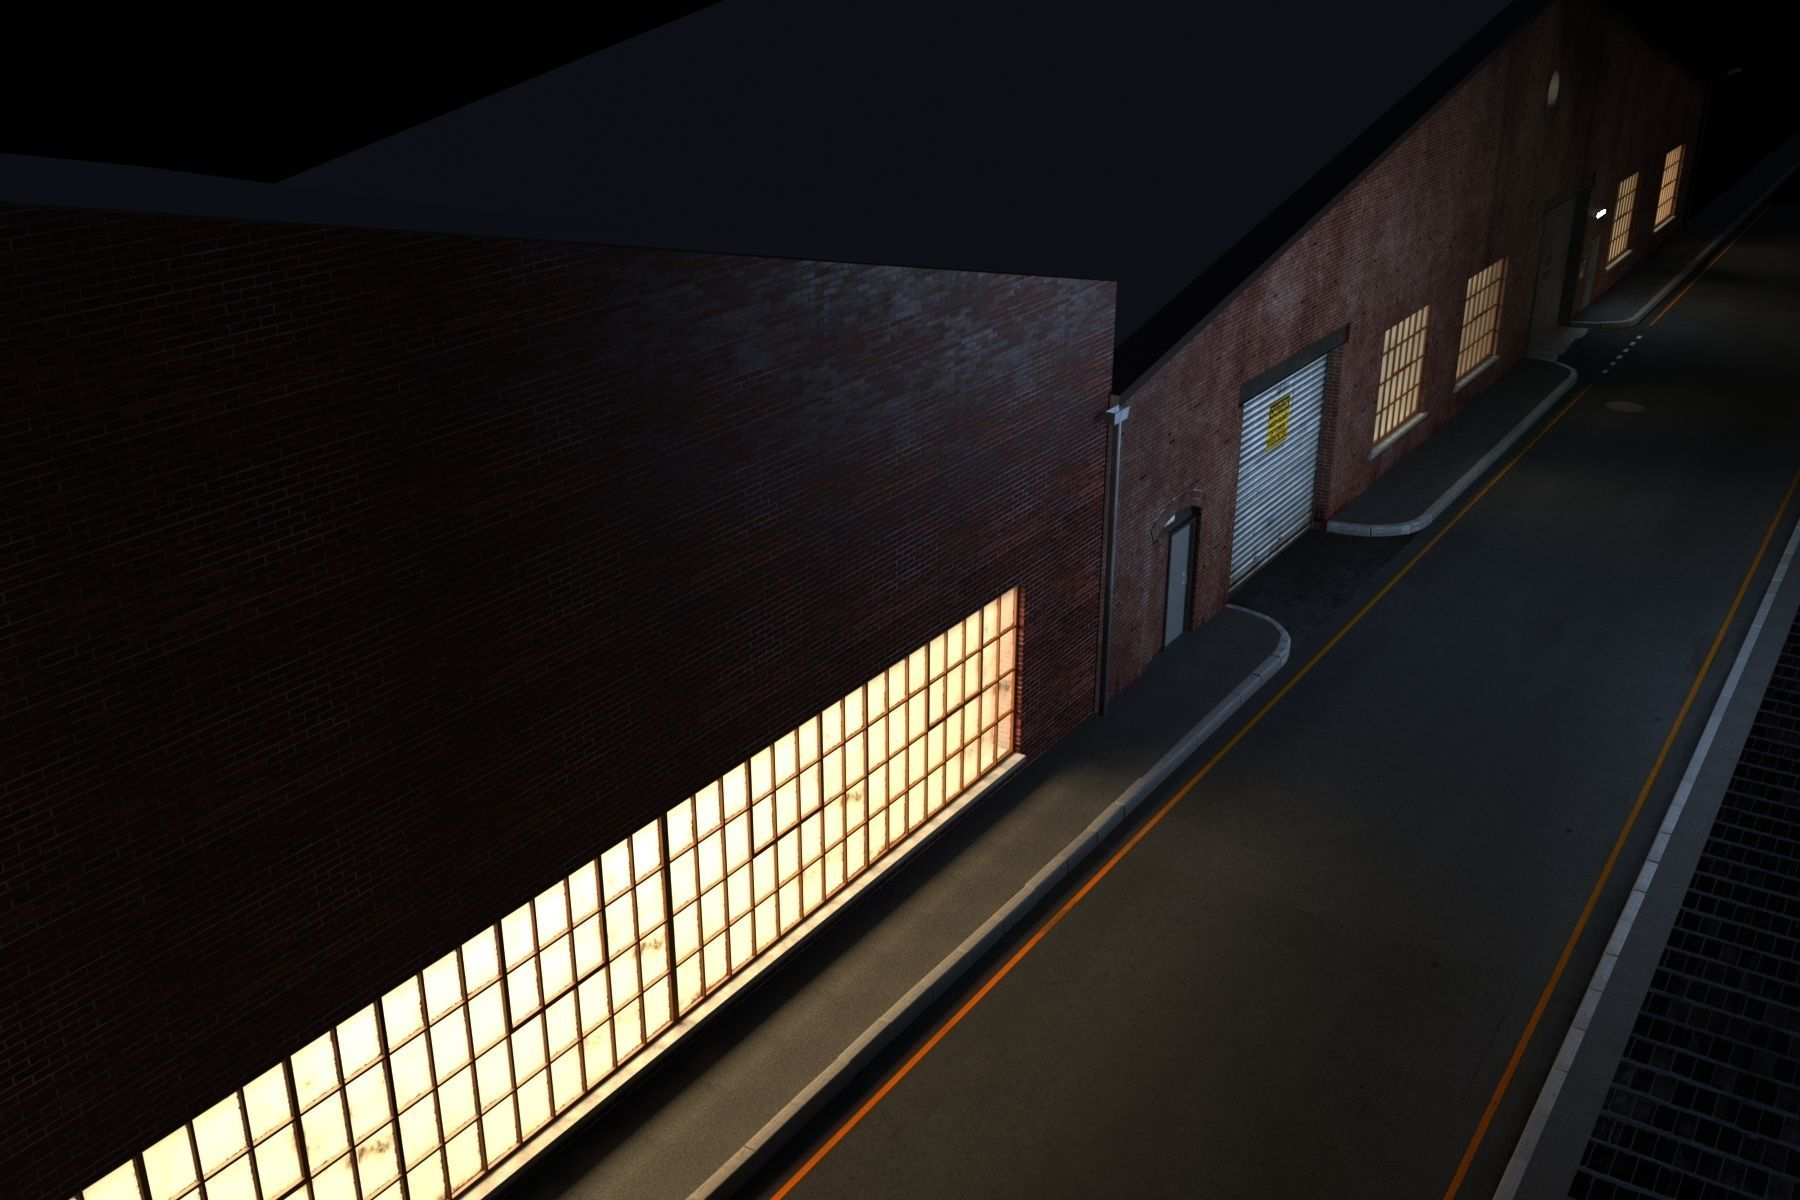 Night Street Scene V-ray